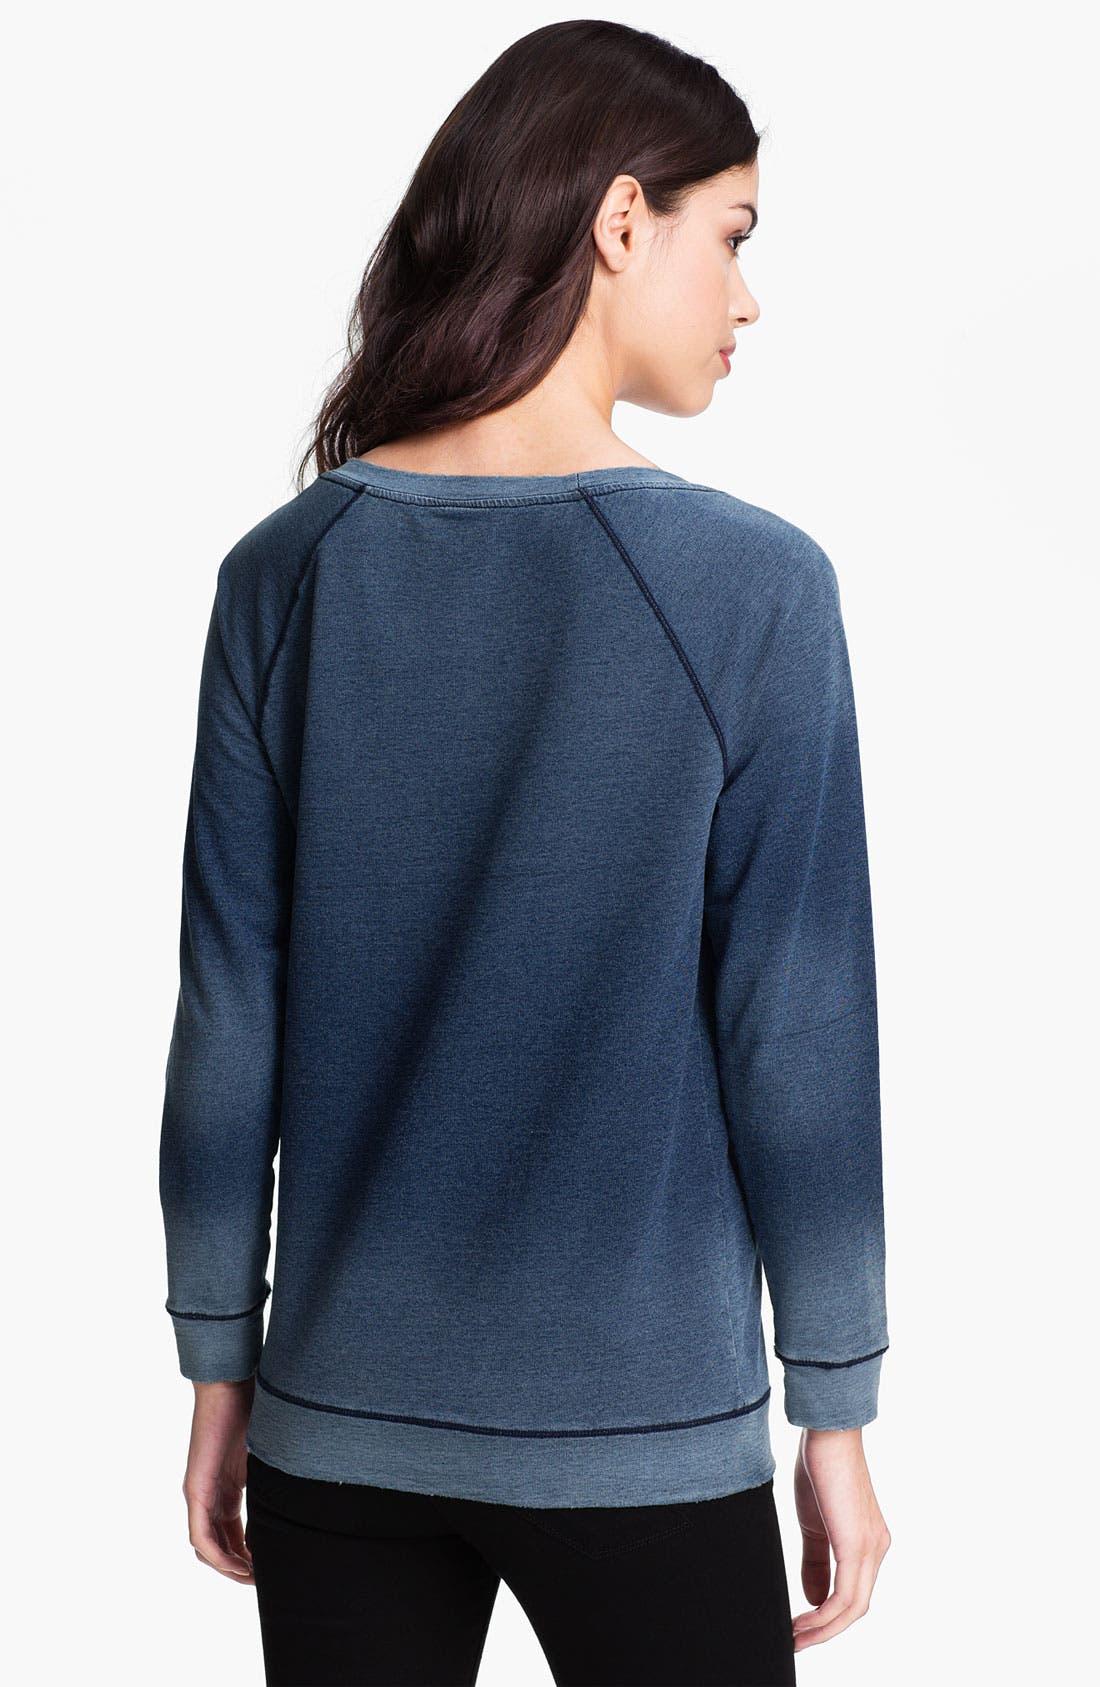 Alternate Image 2  - Soft Joie 'Amity' Ombré Sweatshirt